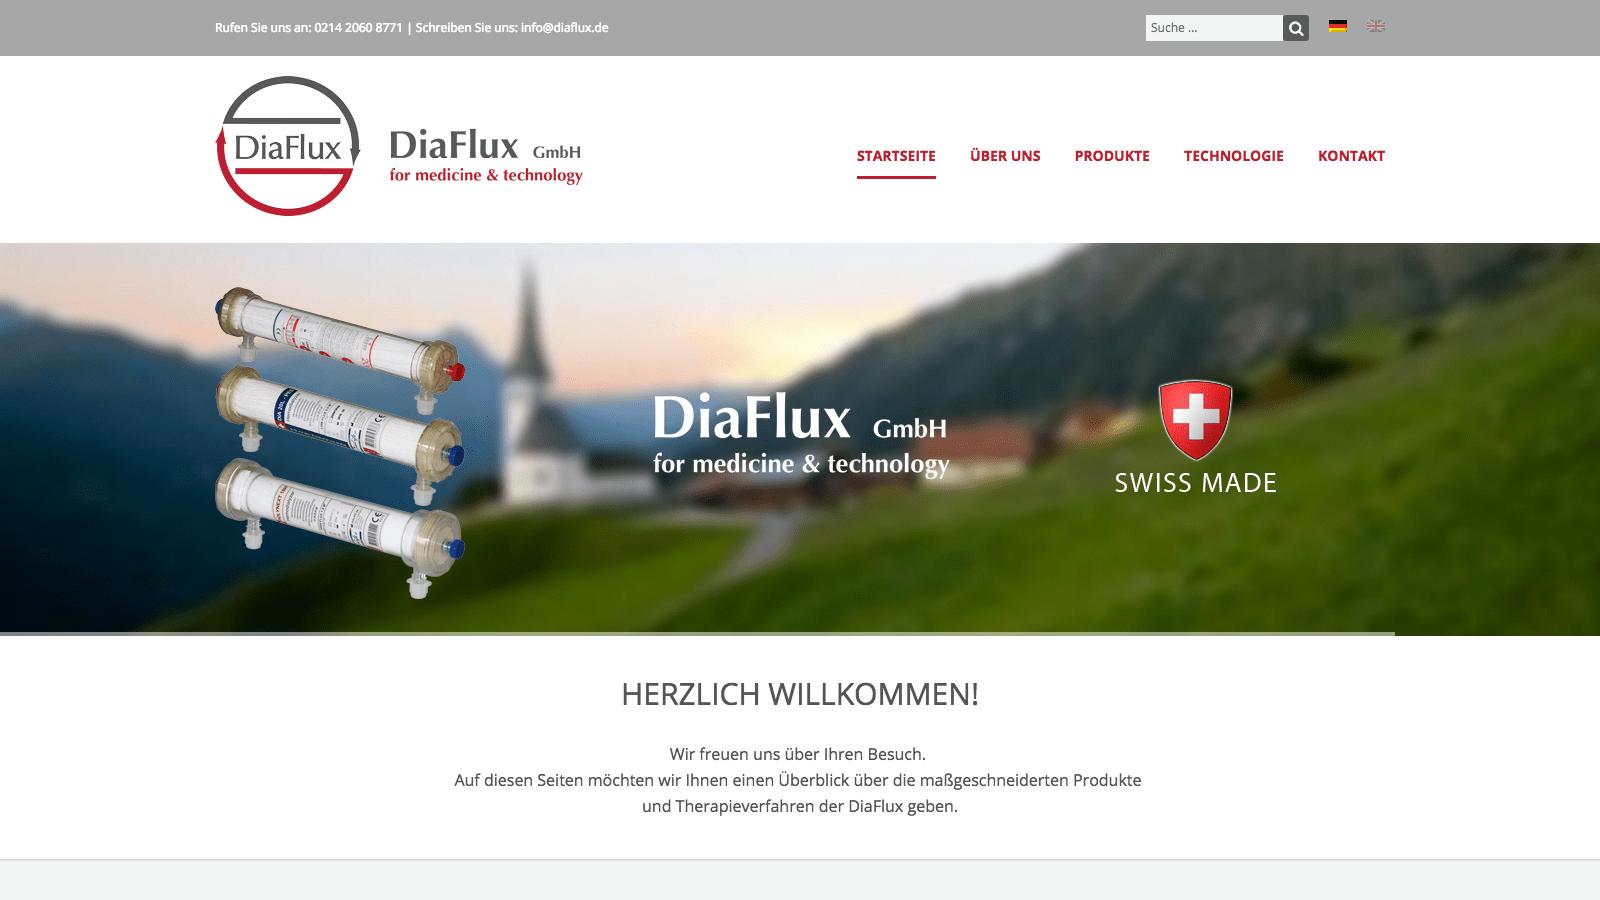 diaflux.de